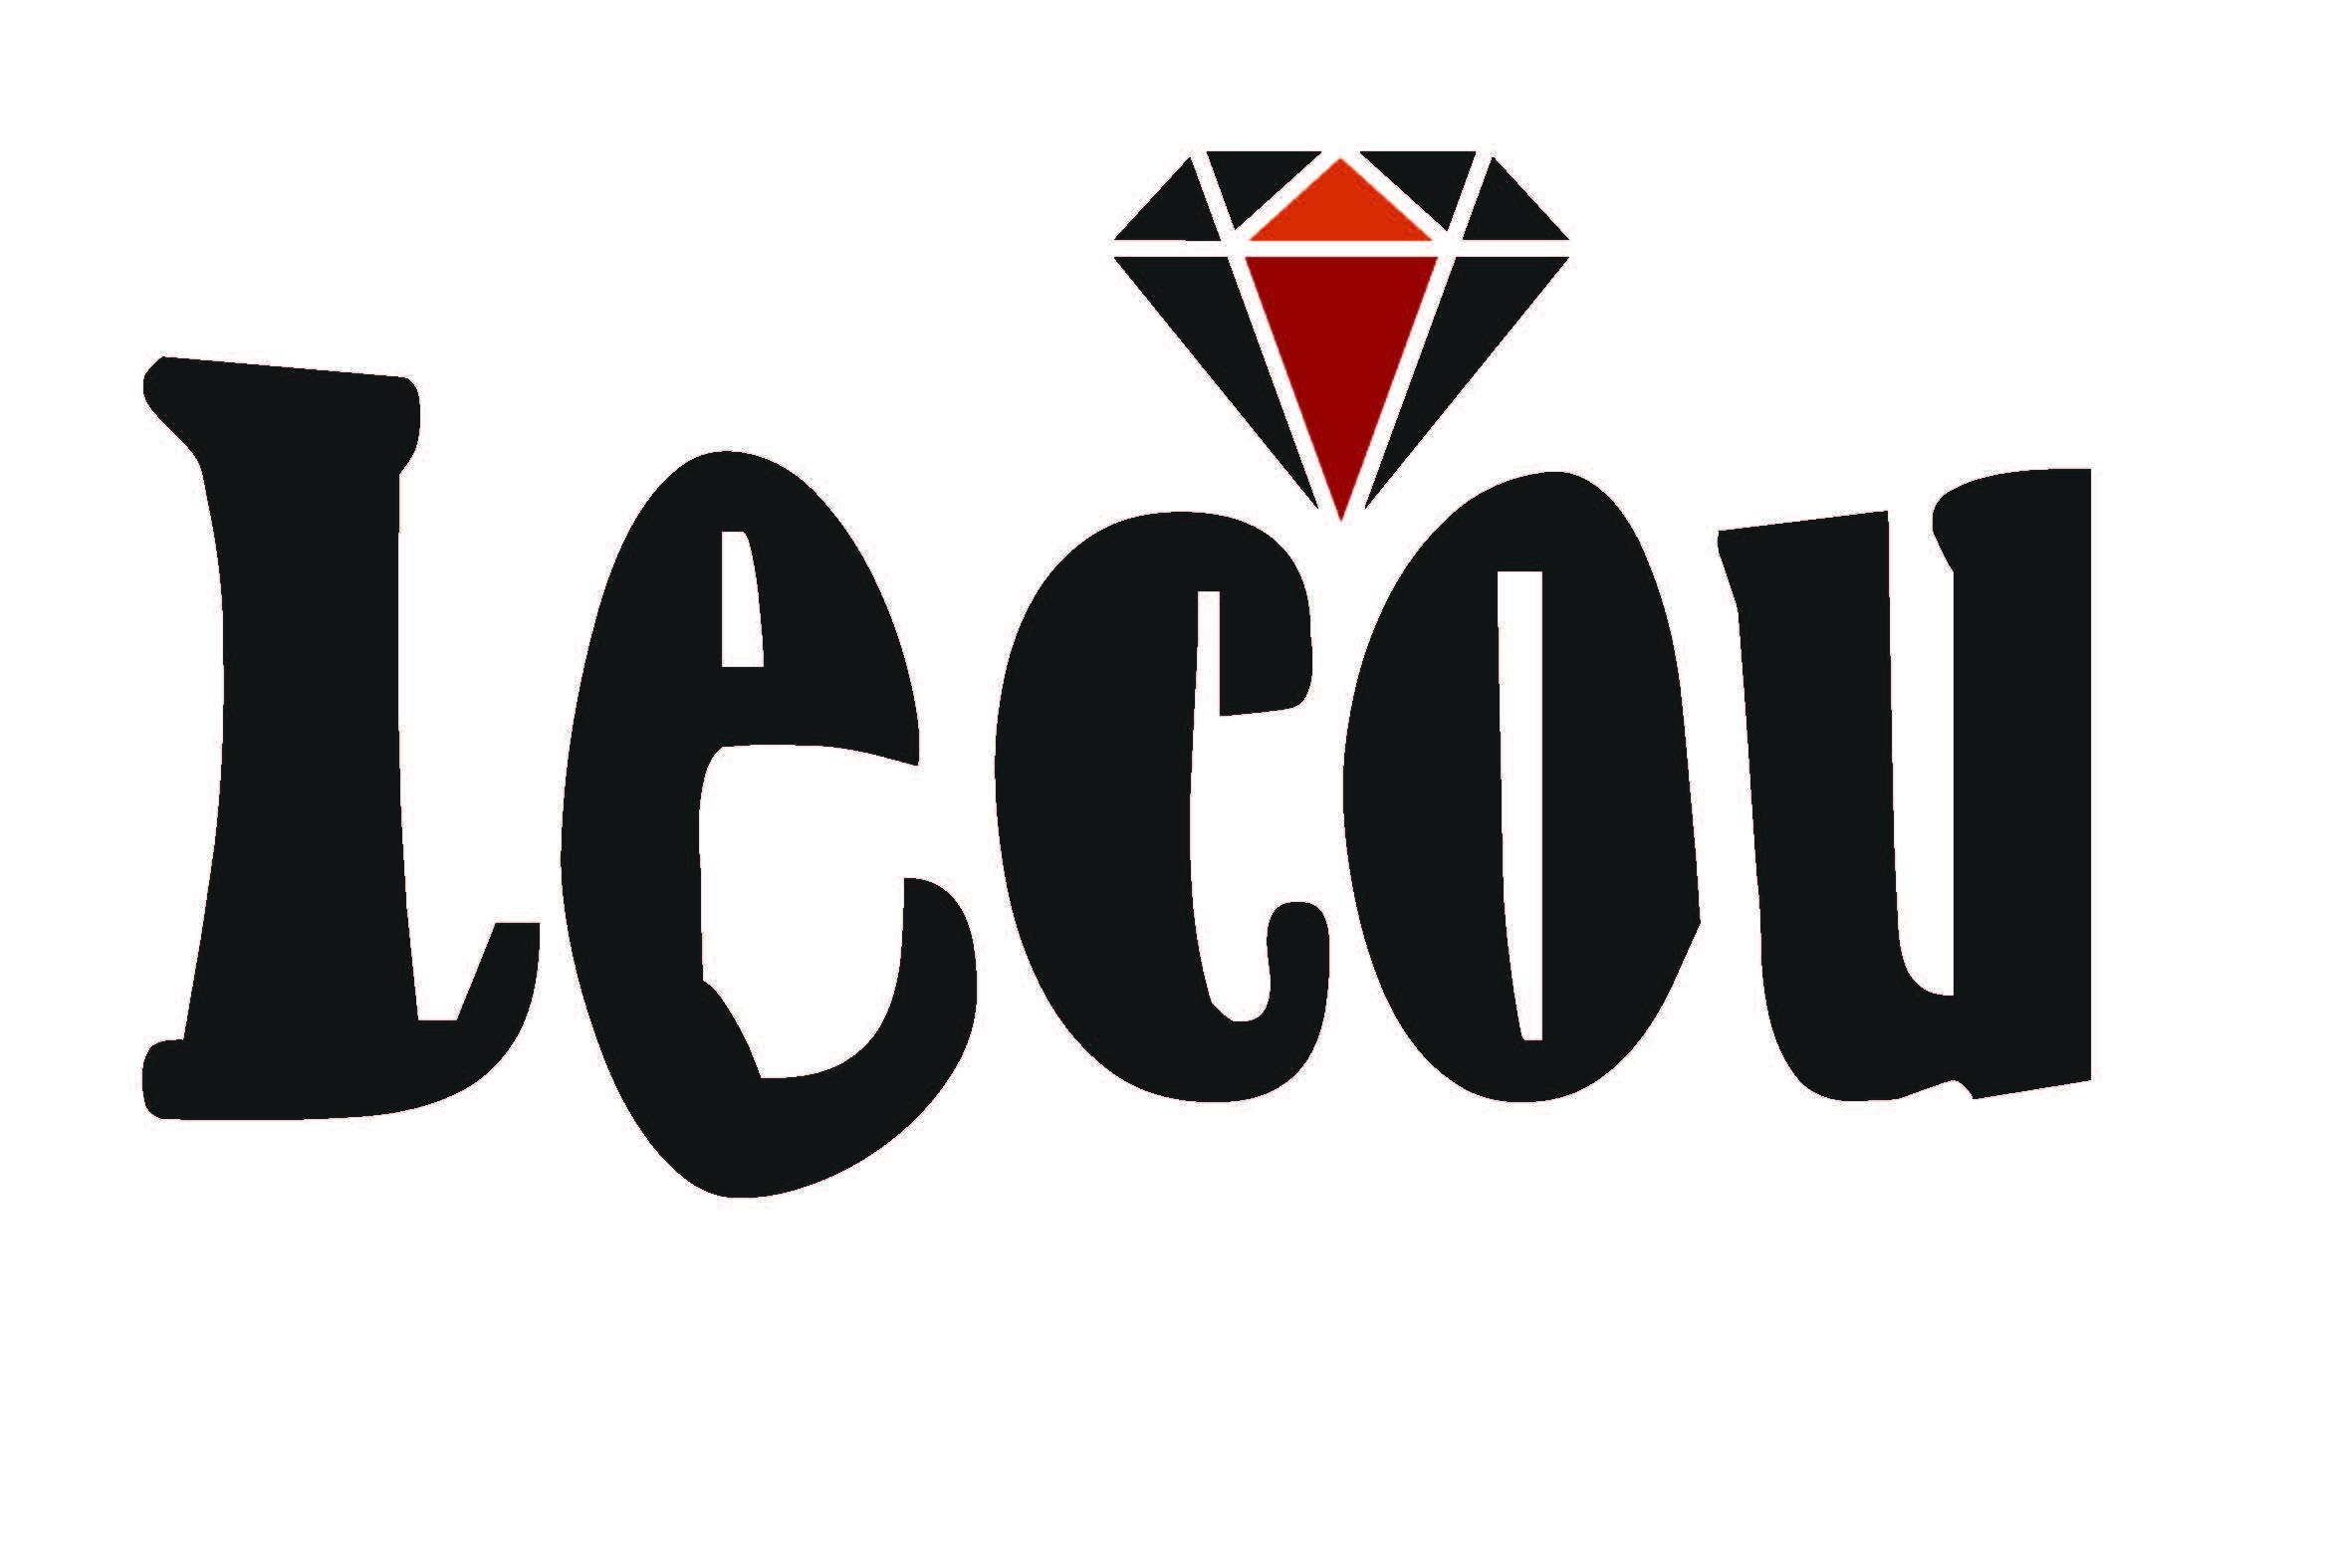 Lecou